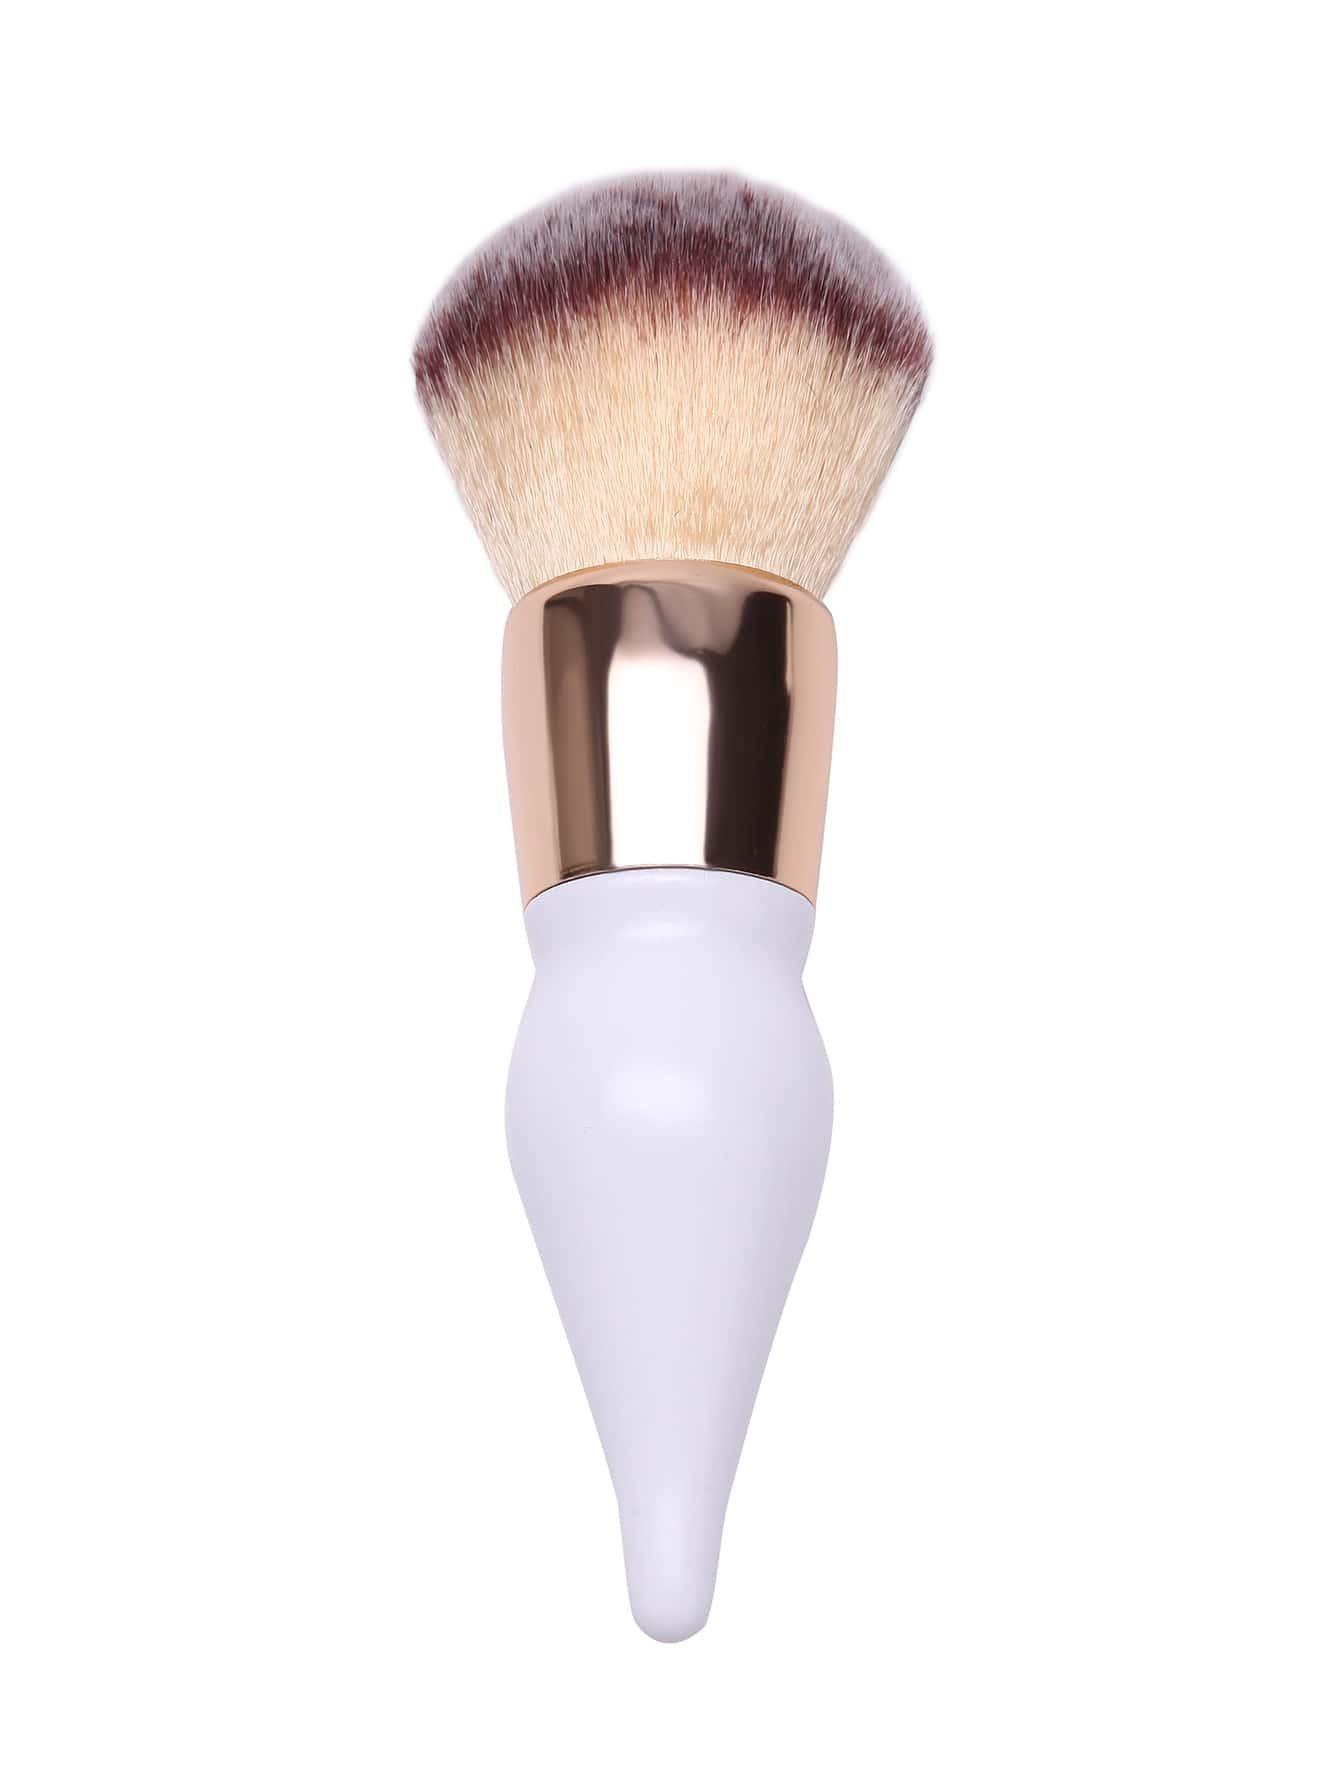 Pearl White Gourd Design Powder Puff Brush